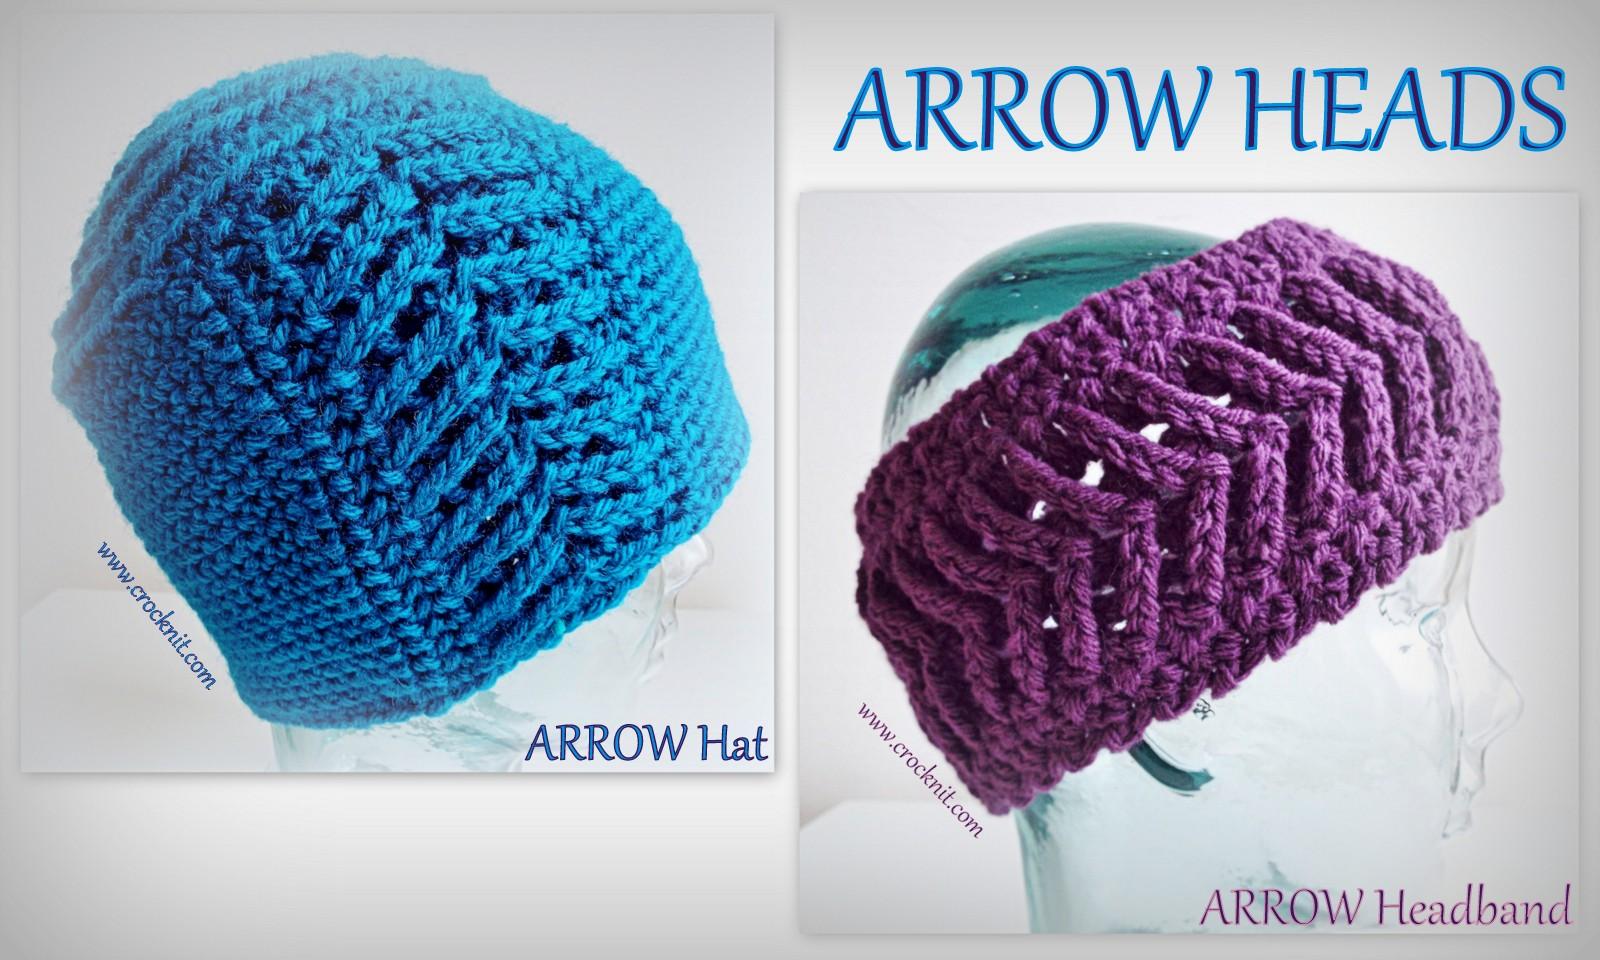 MICROCKNIT CREATIONS: ARROW Heads Crochet Patterns